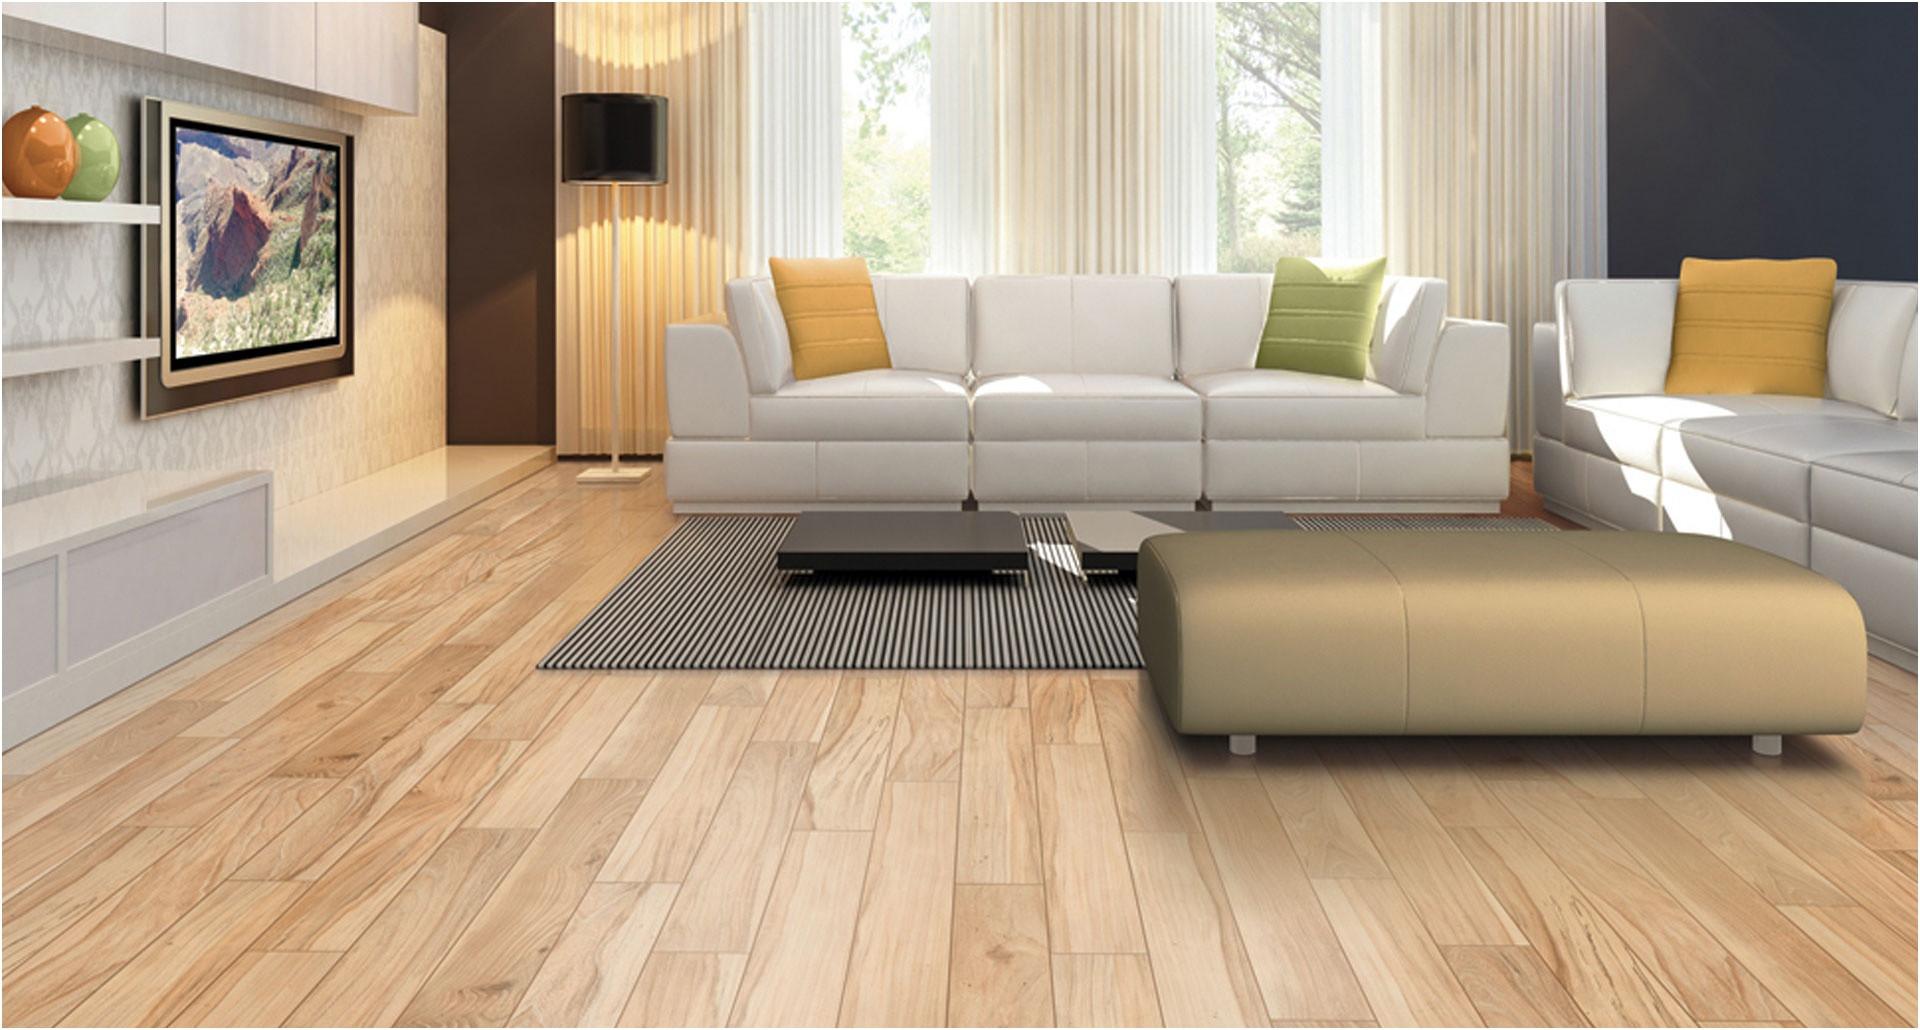 Bruce Hardwood Floor Cleaner Lowes Of Lowes Hardwood Flooring Installation Cost Inspirational Flooring with Regard to Lowes Hardwood Flooring Installation Cost Inspirational Flooring Pergo Oak Lowes Pergo